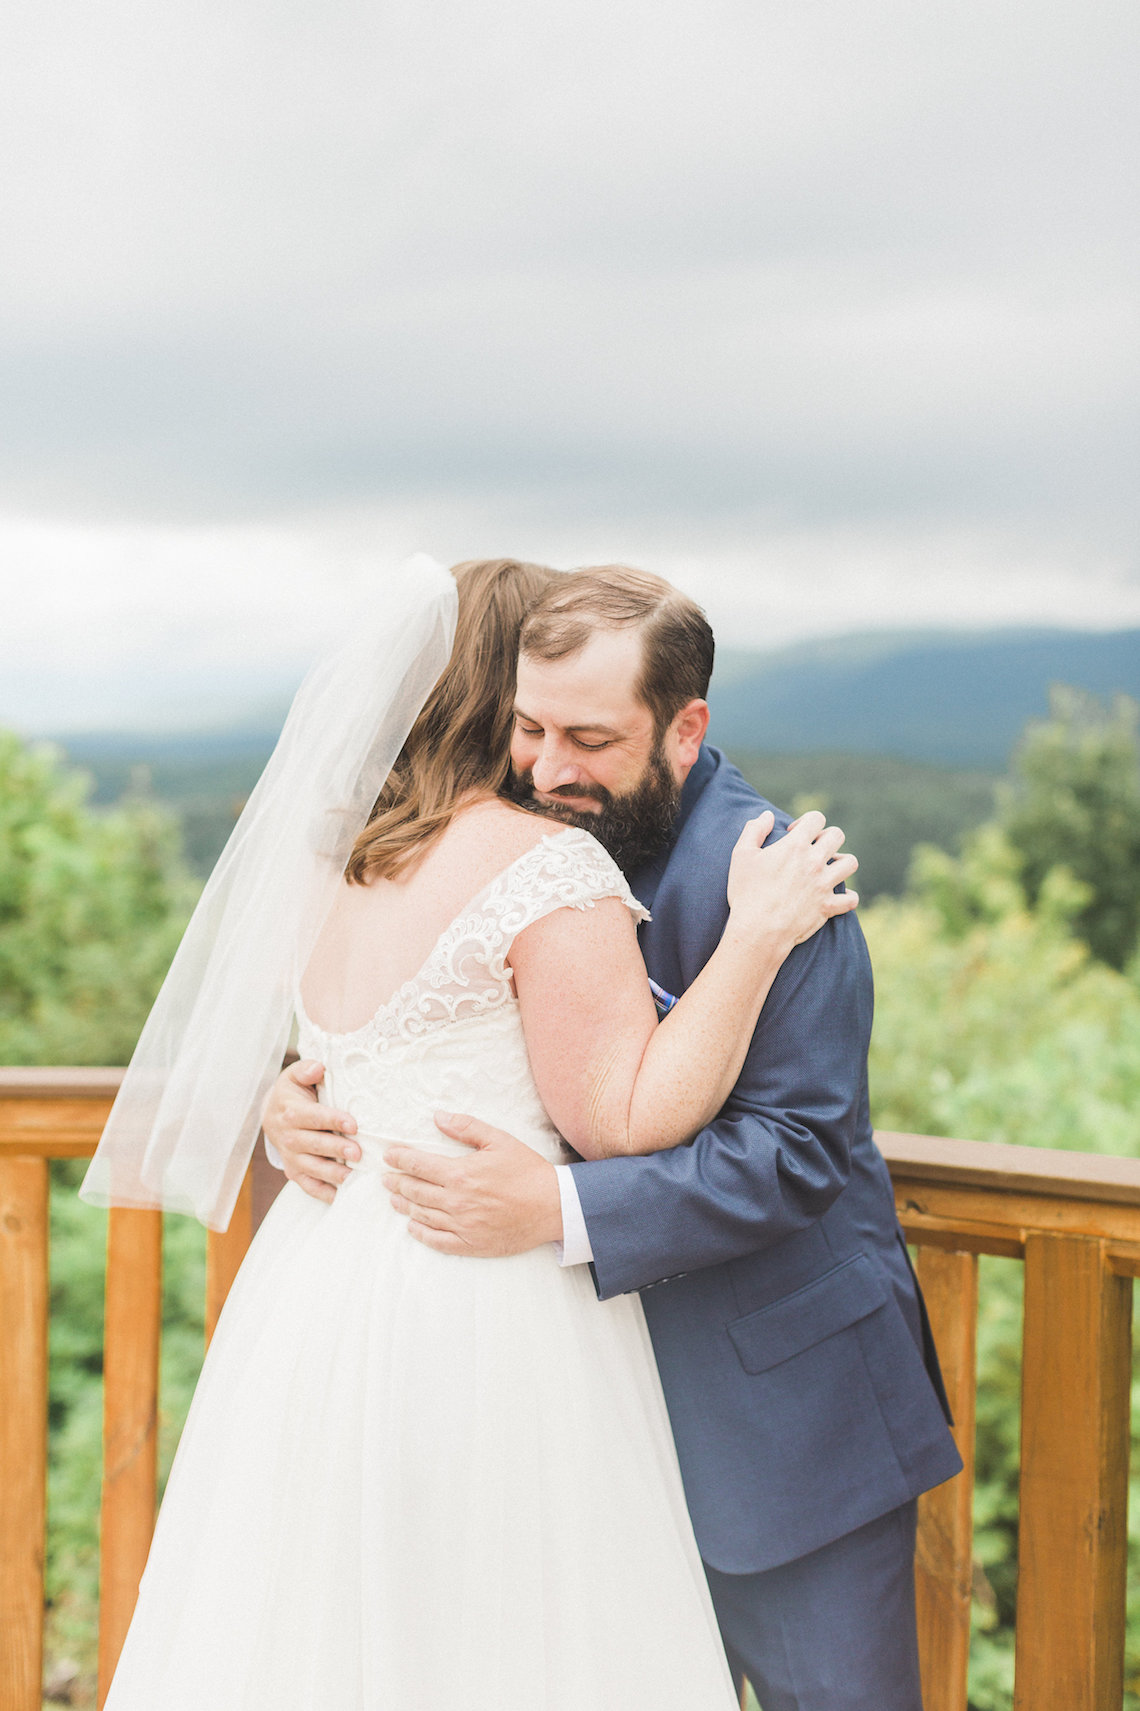 Rustic Carolina Mountain Lodge Wedding | Common Dove Photography 9